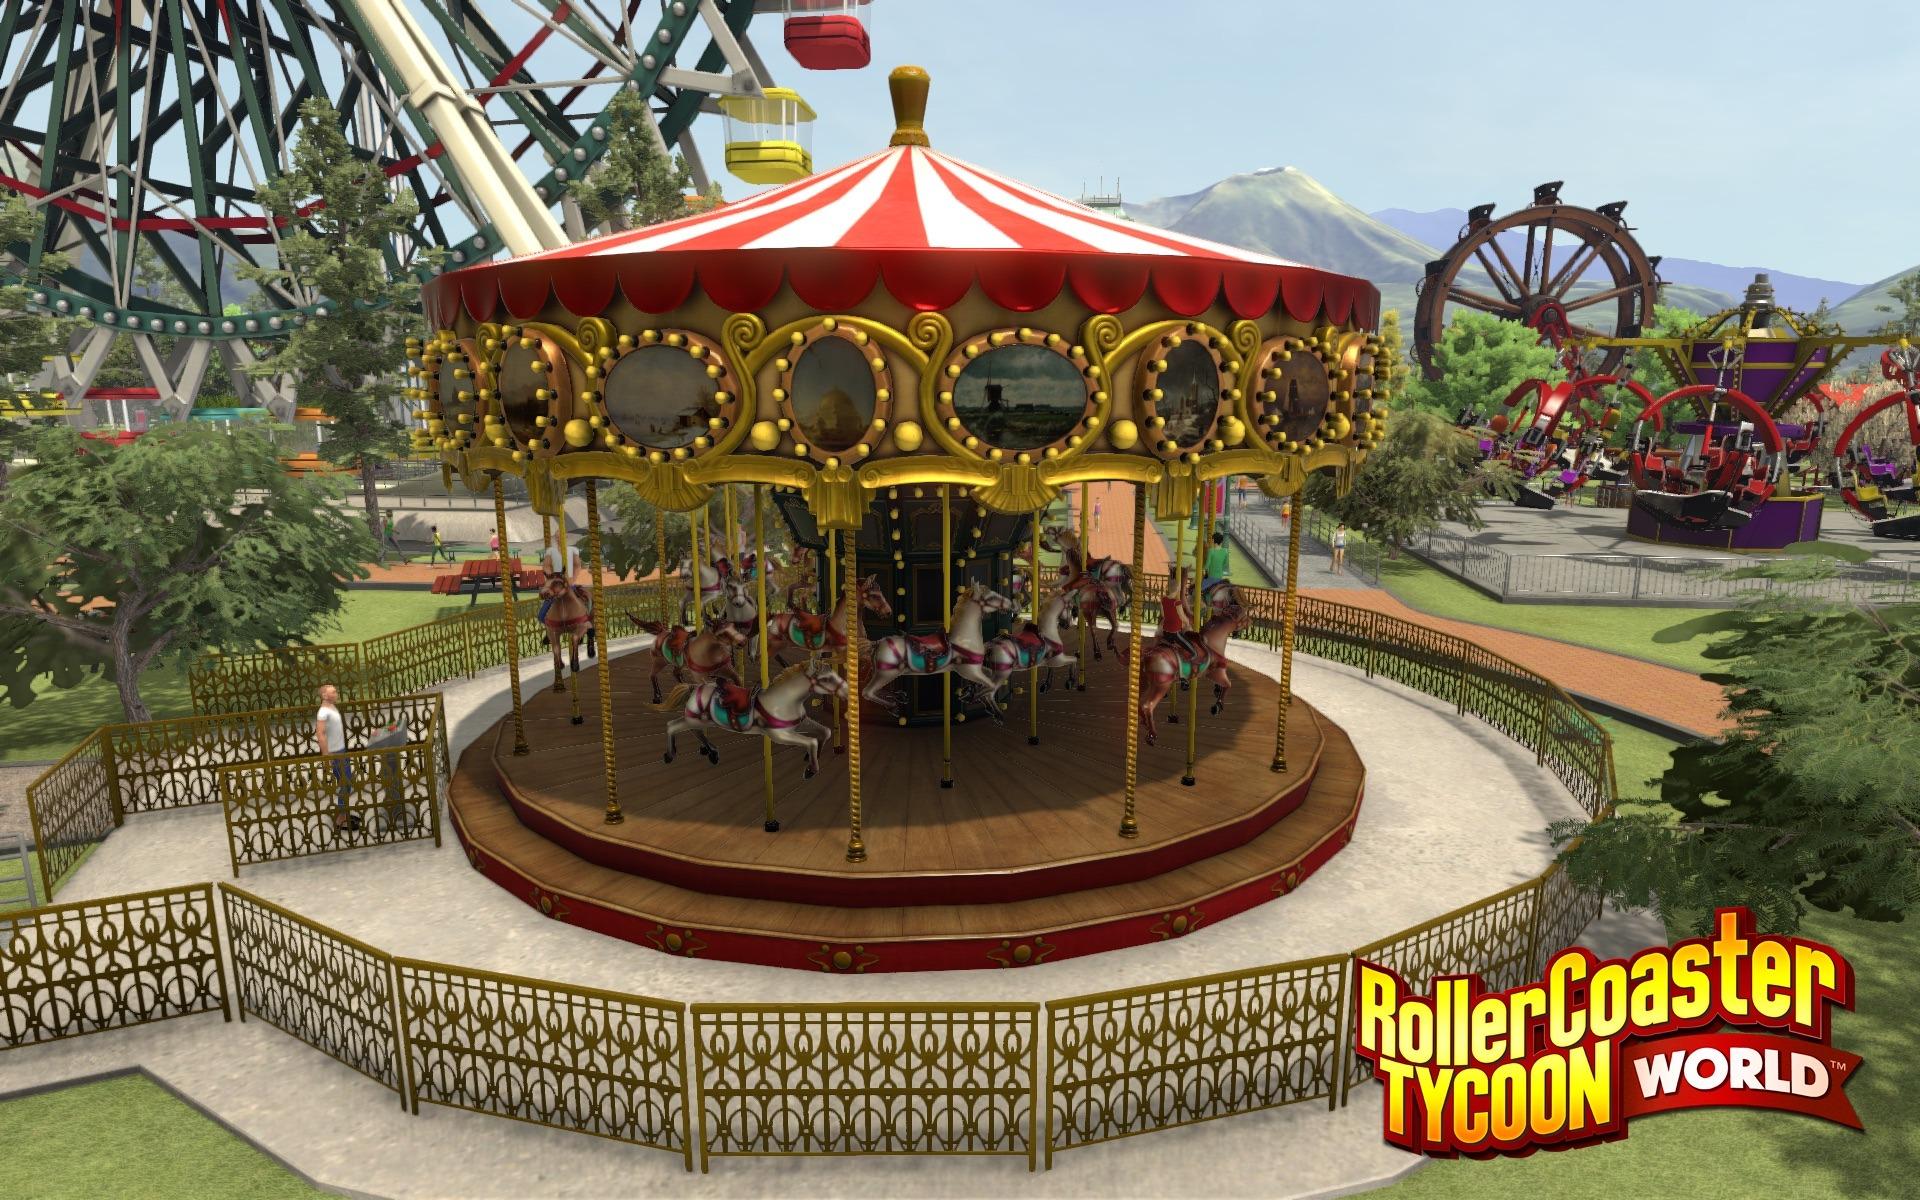 RollerCoaster Tycoon World 1441454784-754-noelshack-capture-d-ecran-pc-simulation